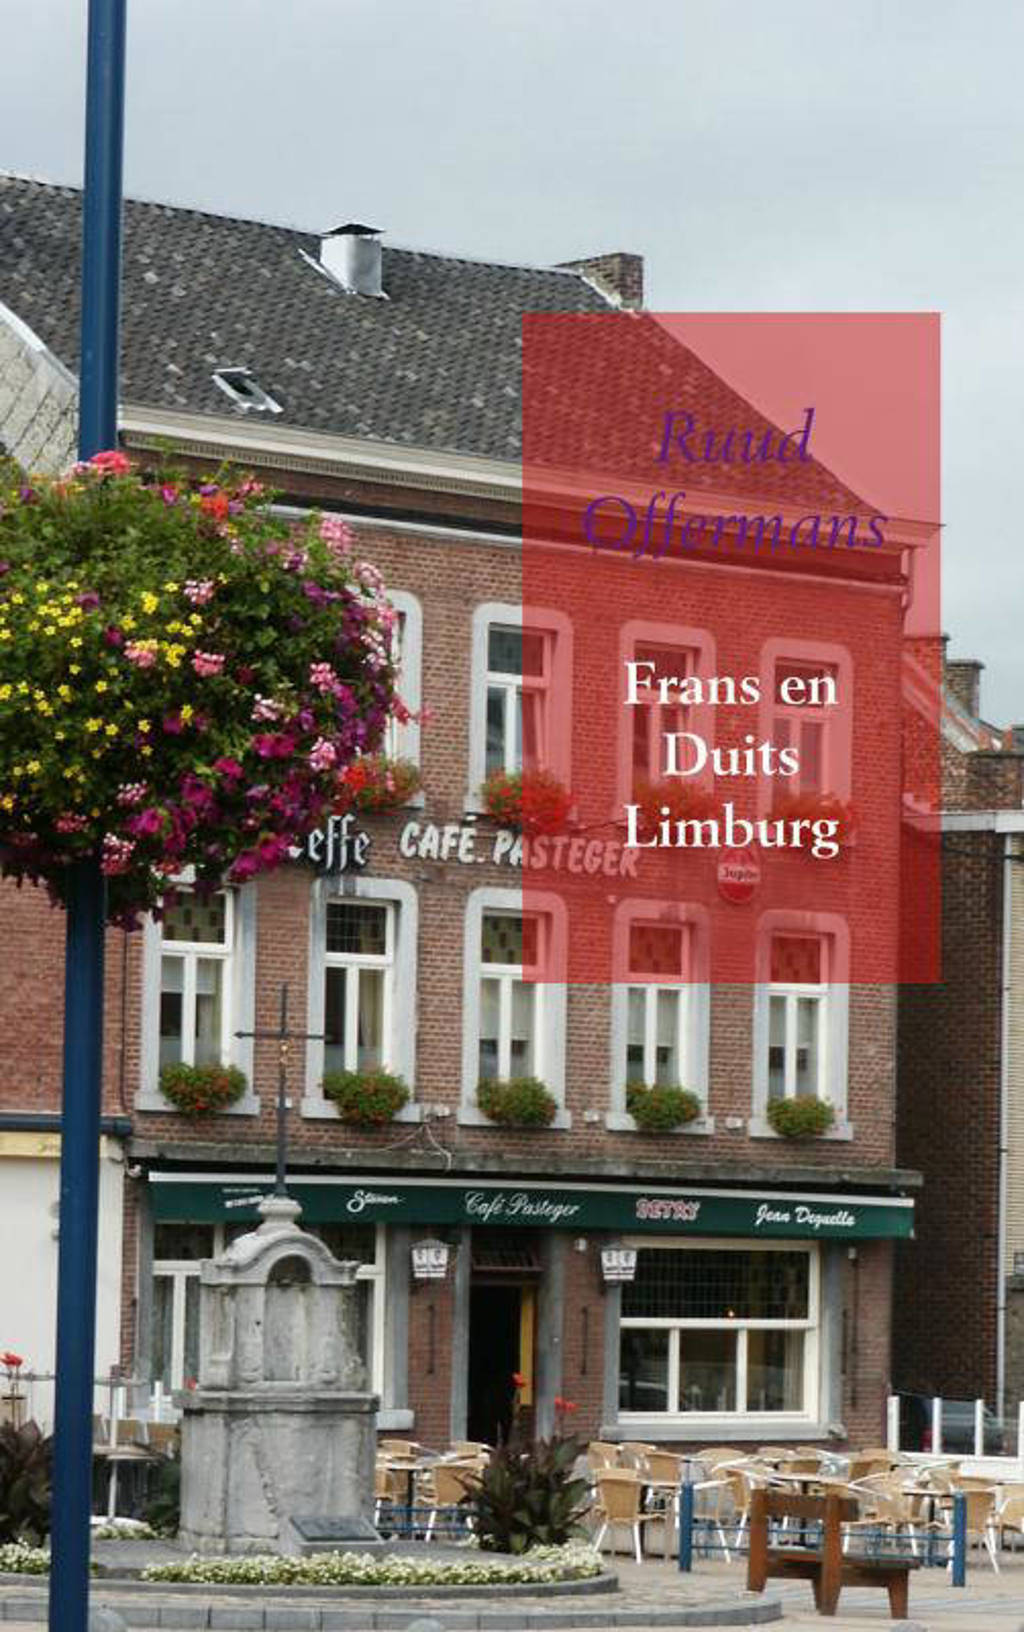 Frans en Duits Limburg - Ruud Offermans